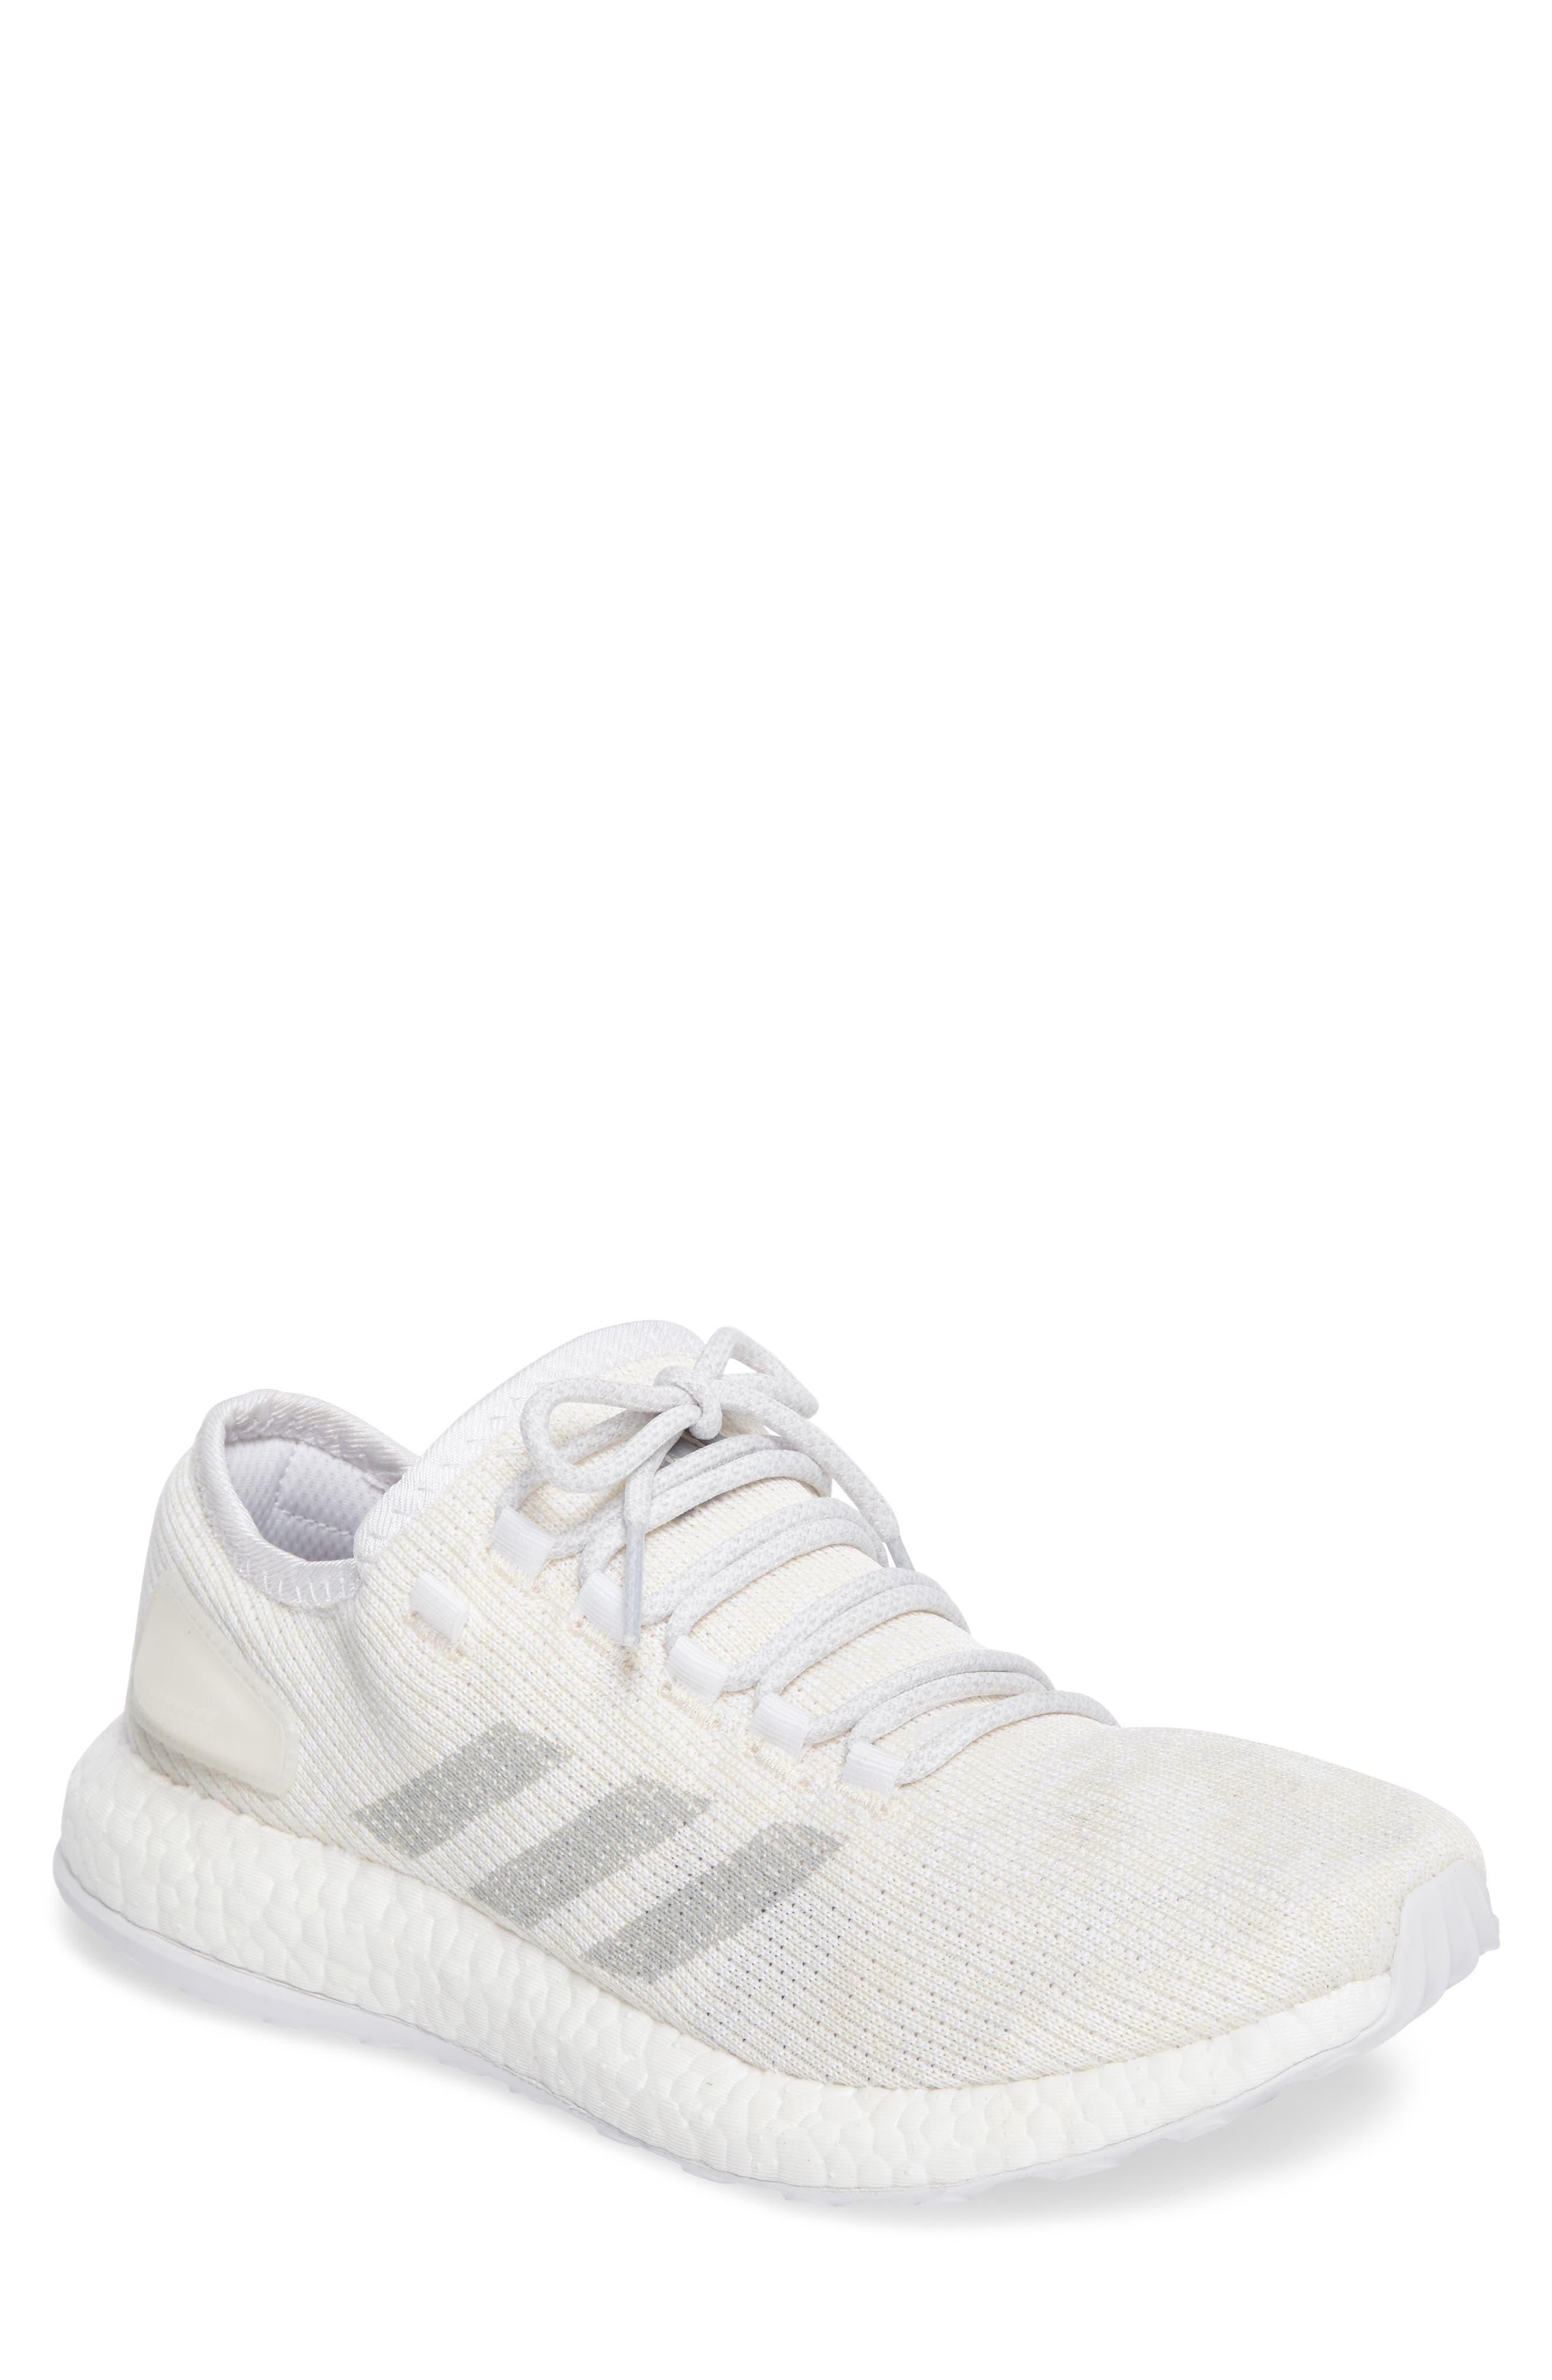 adidas PureBoost Clima Sneaker (Men)